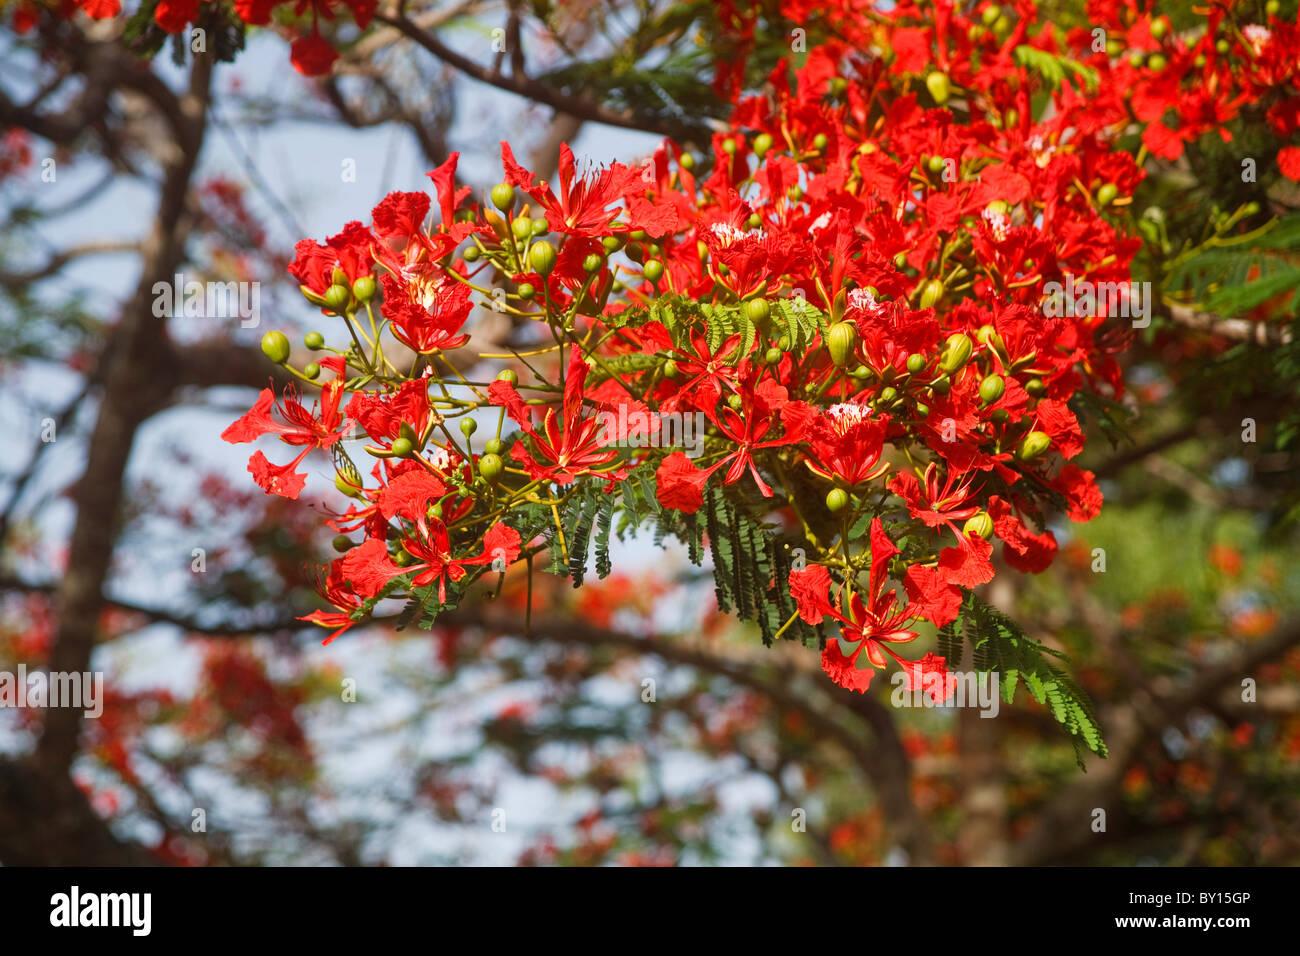 Flamboyant tree in full bloom, Botanical gardens Trinidad - Stock Image